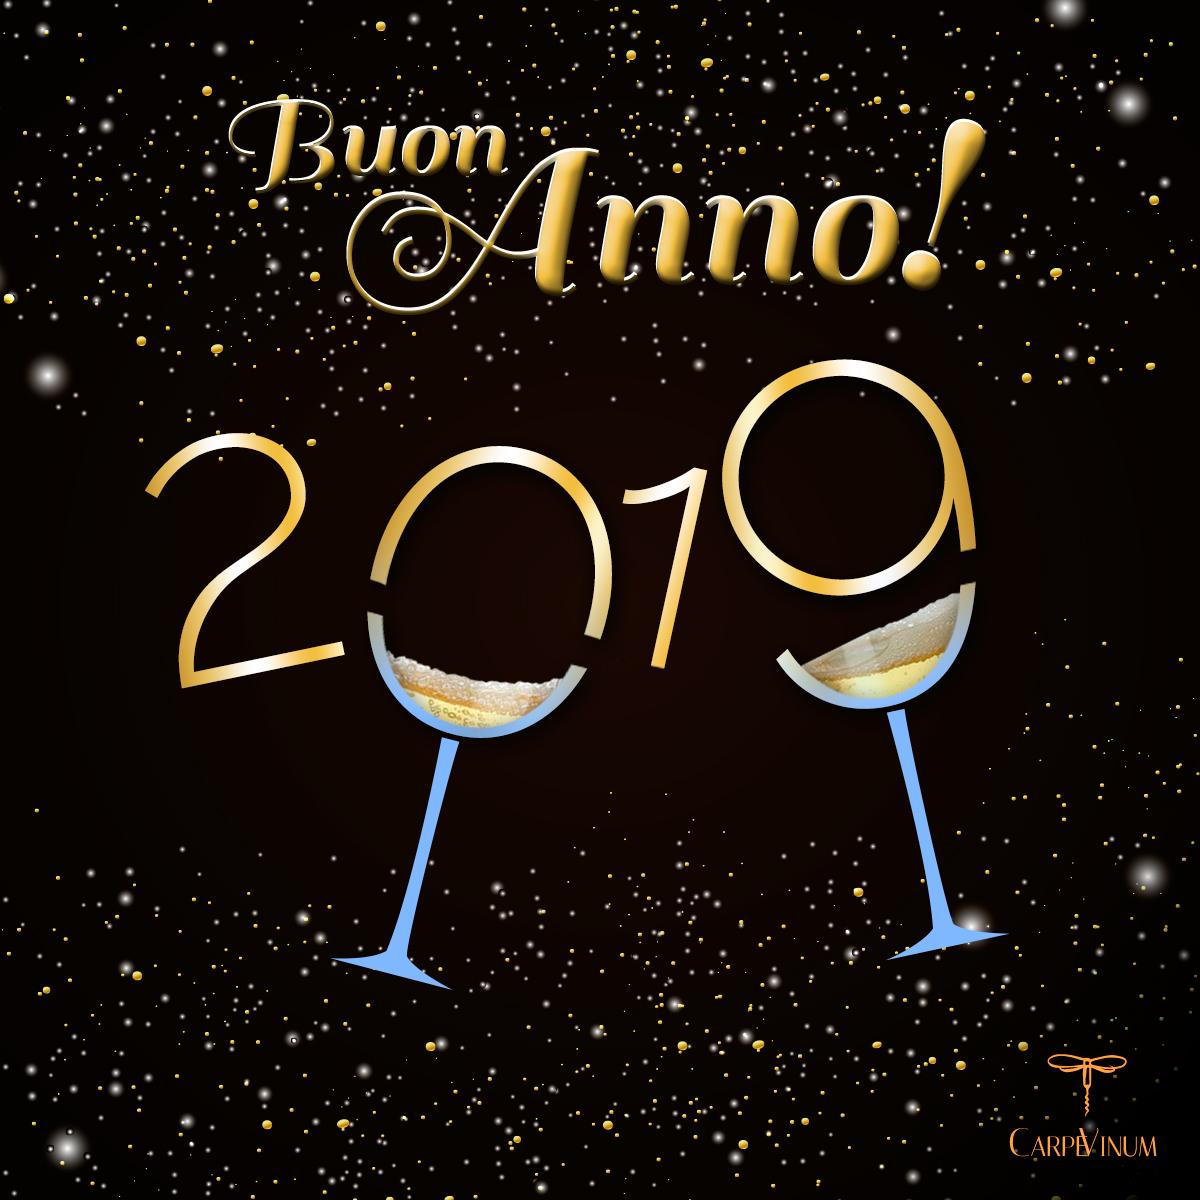 Buon 2019 da Carpe Vinum!